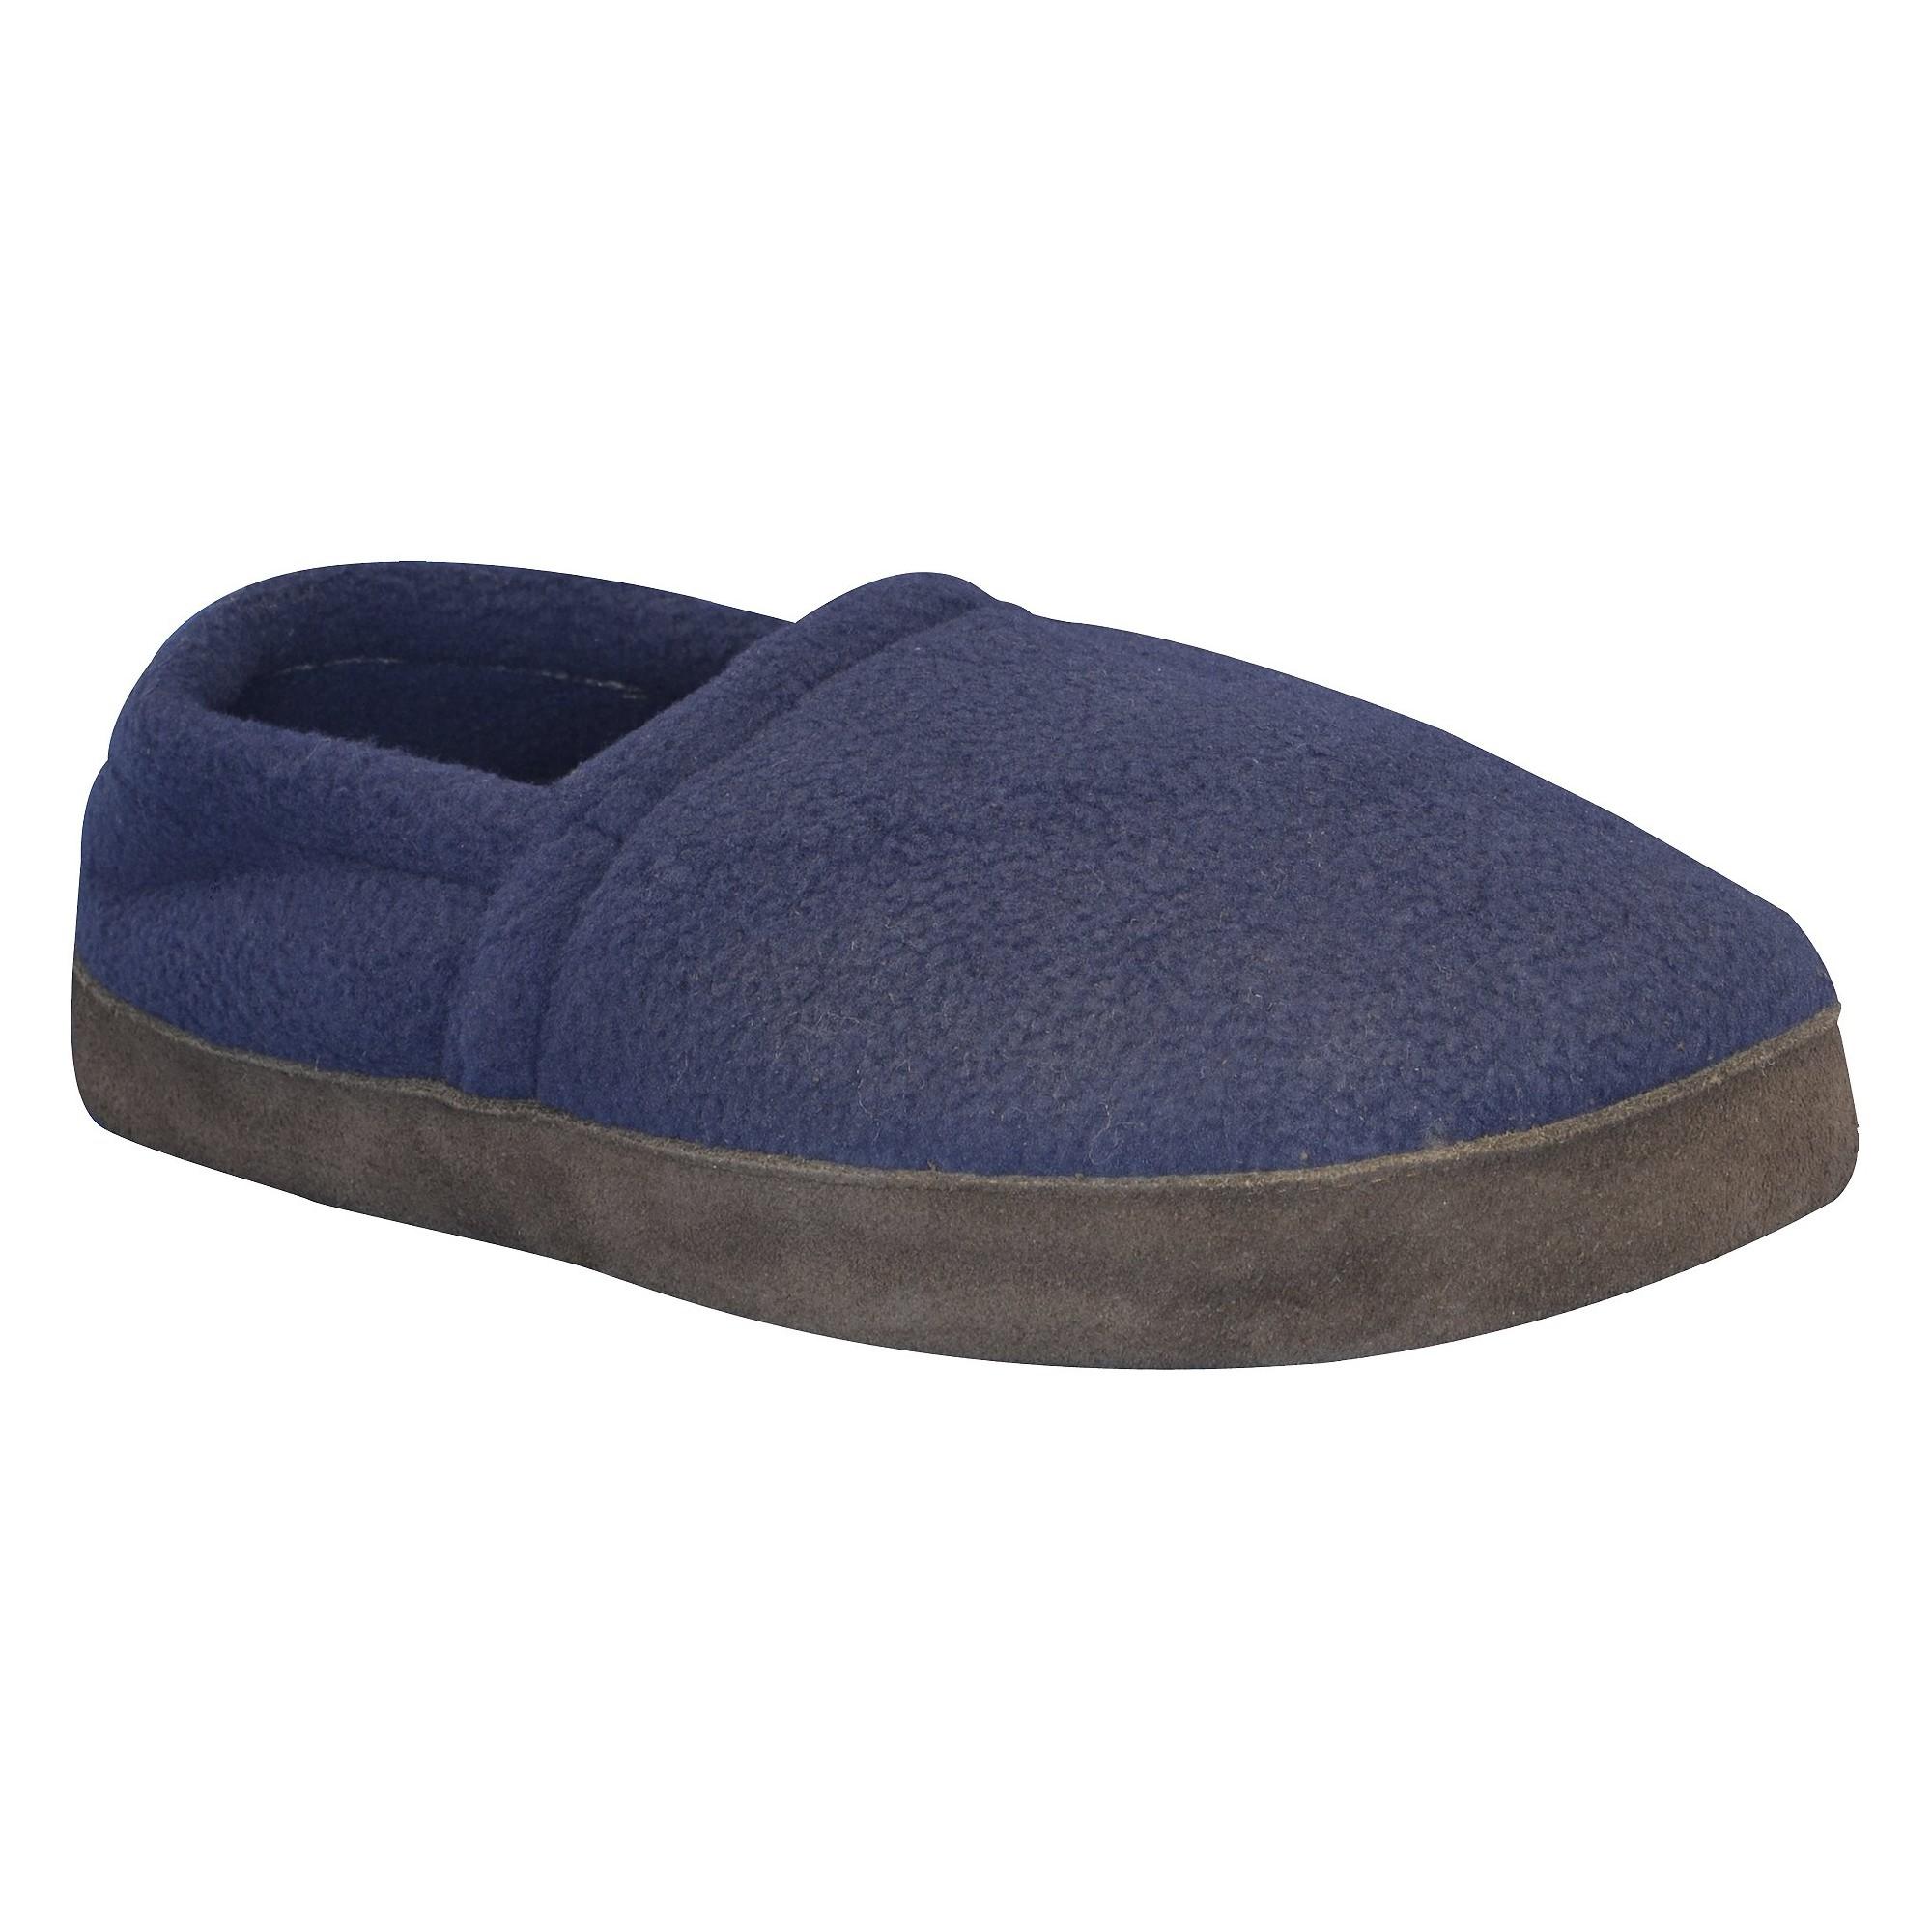 Men's MUK LUKS Fleece Espadrille Slippers - Navy S(7-8), Women's, Size: Small (7-8), Blue